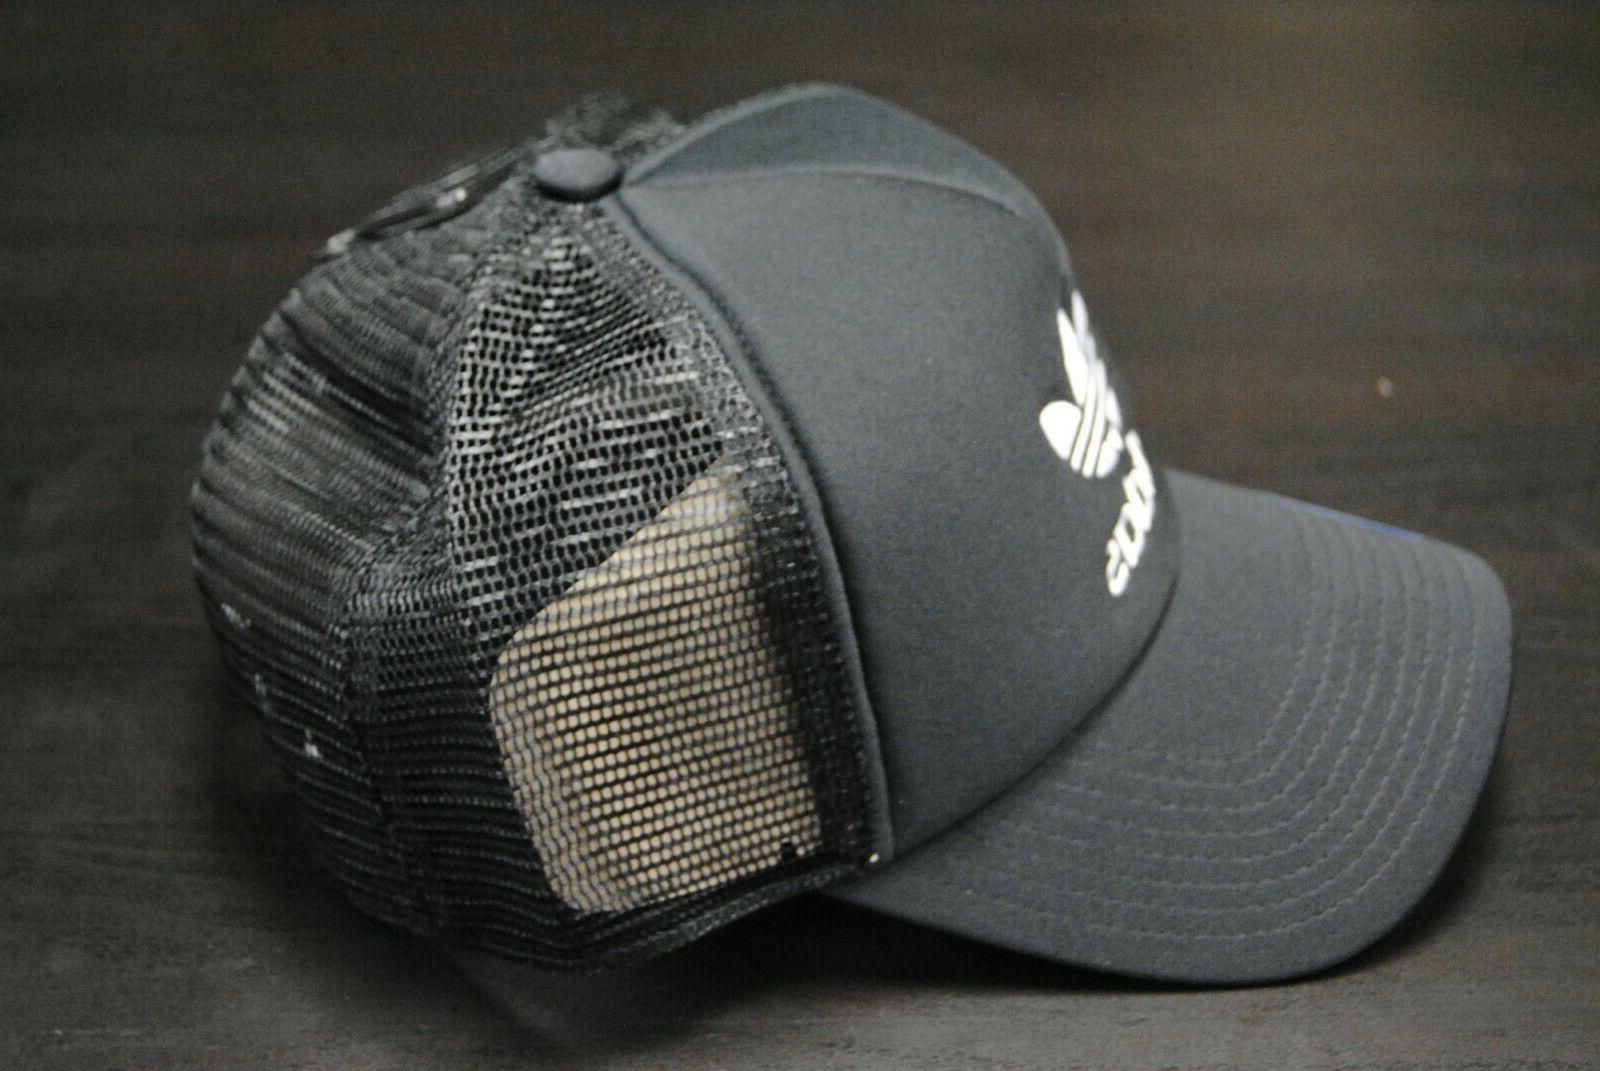 NEW MEN'S CK5055 SNAPBACK HAT